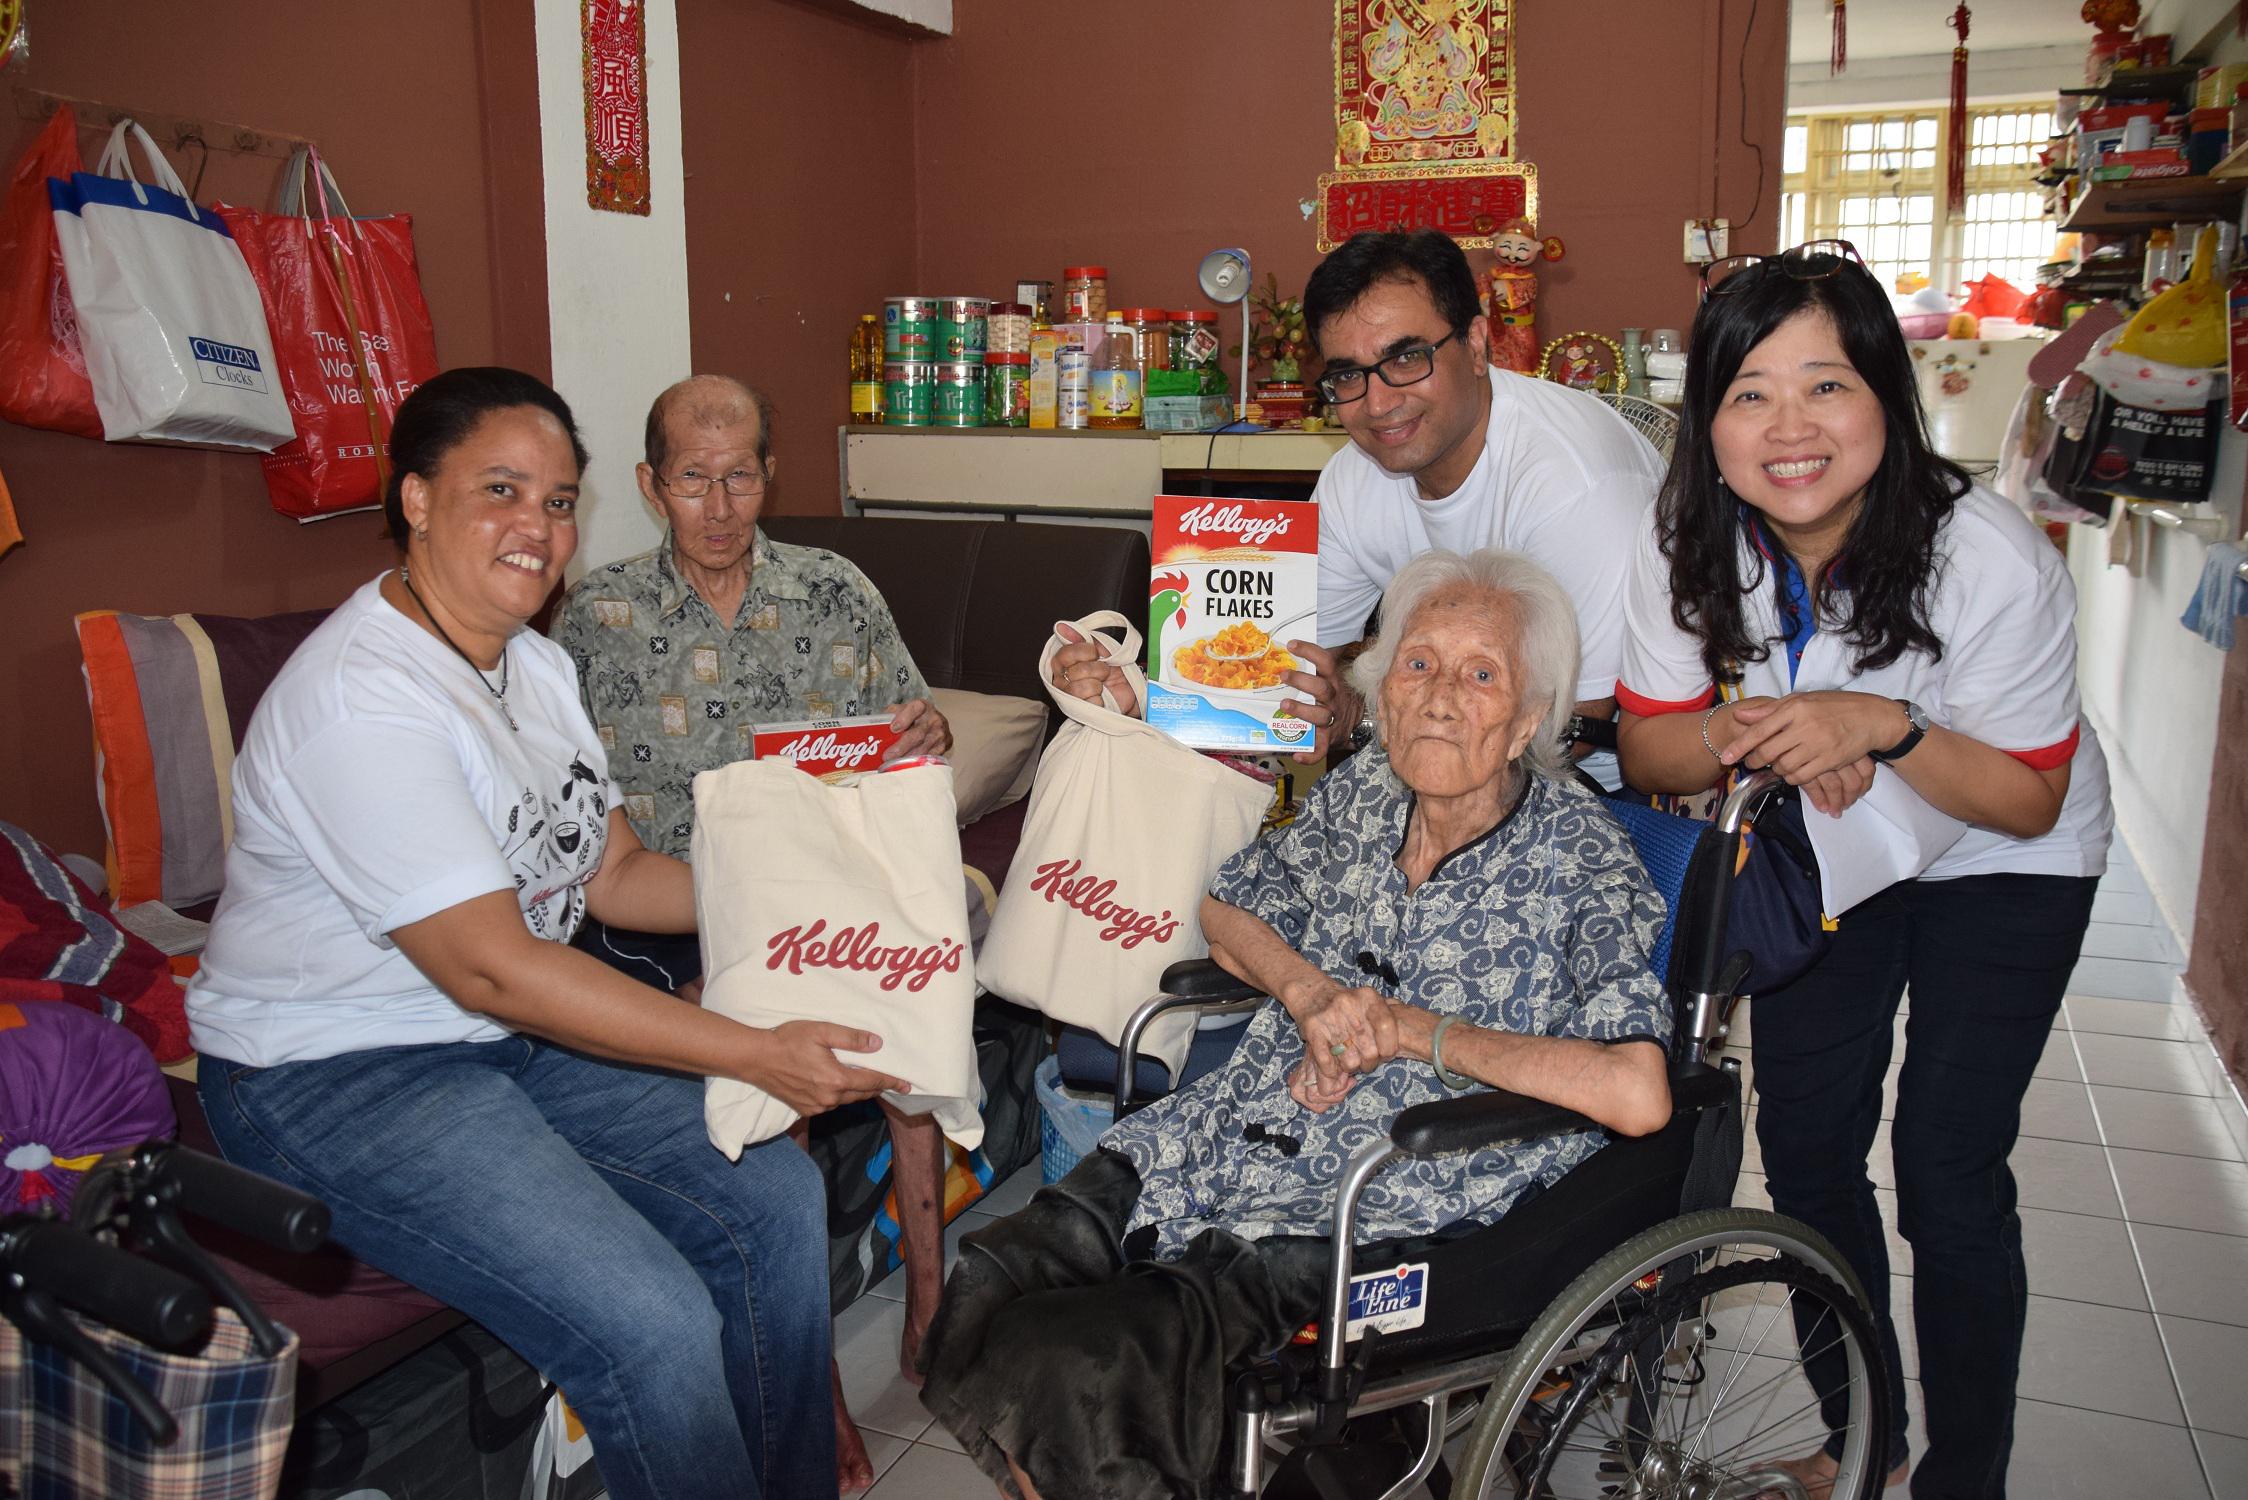 Kellogg employees achieved more than 7,400 employee volunteer days